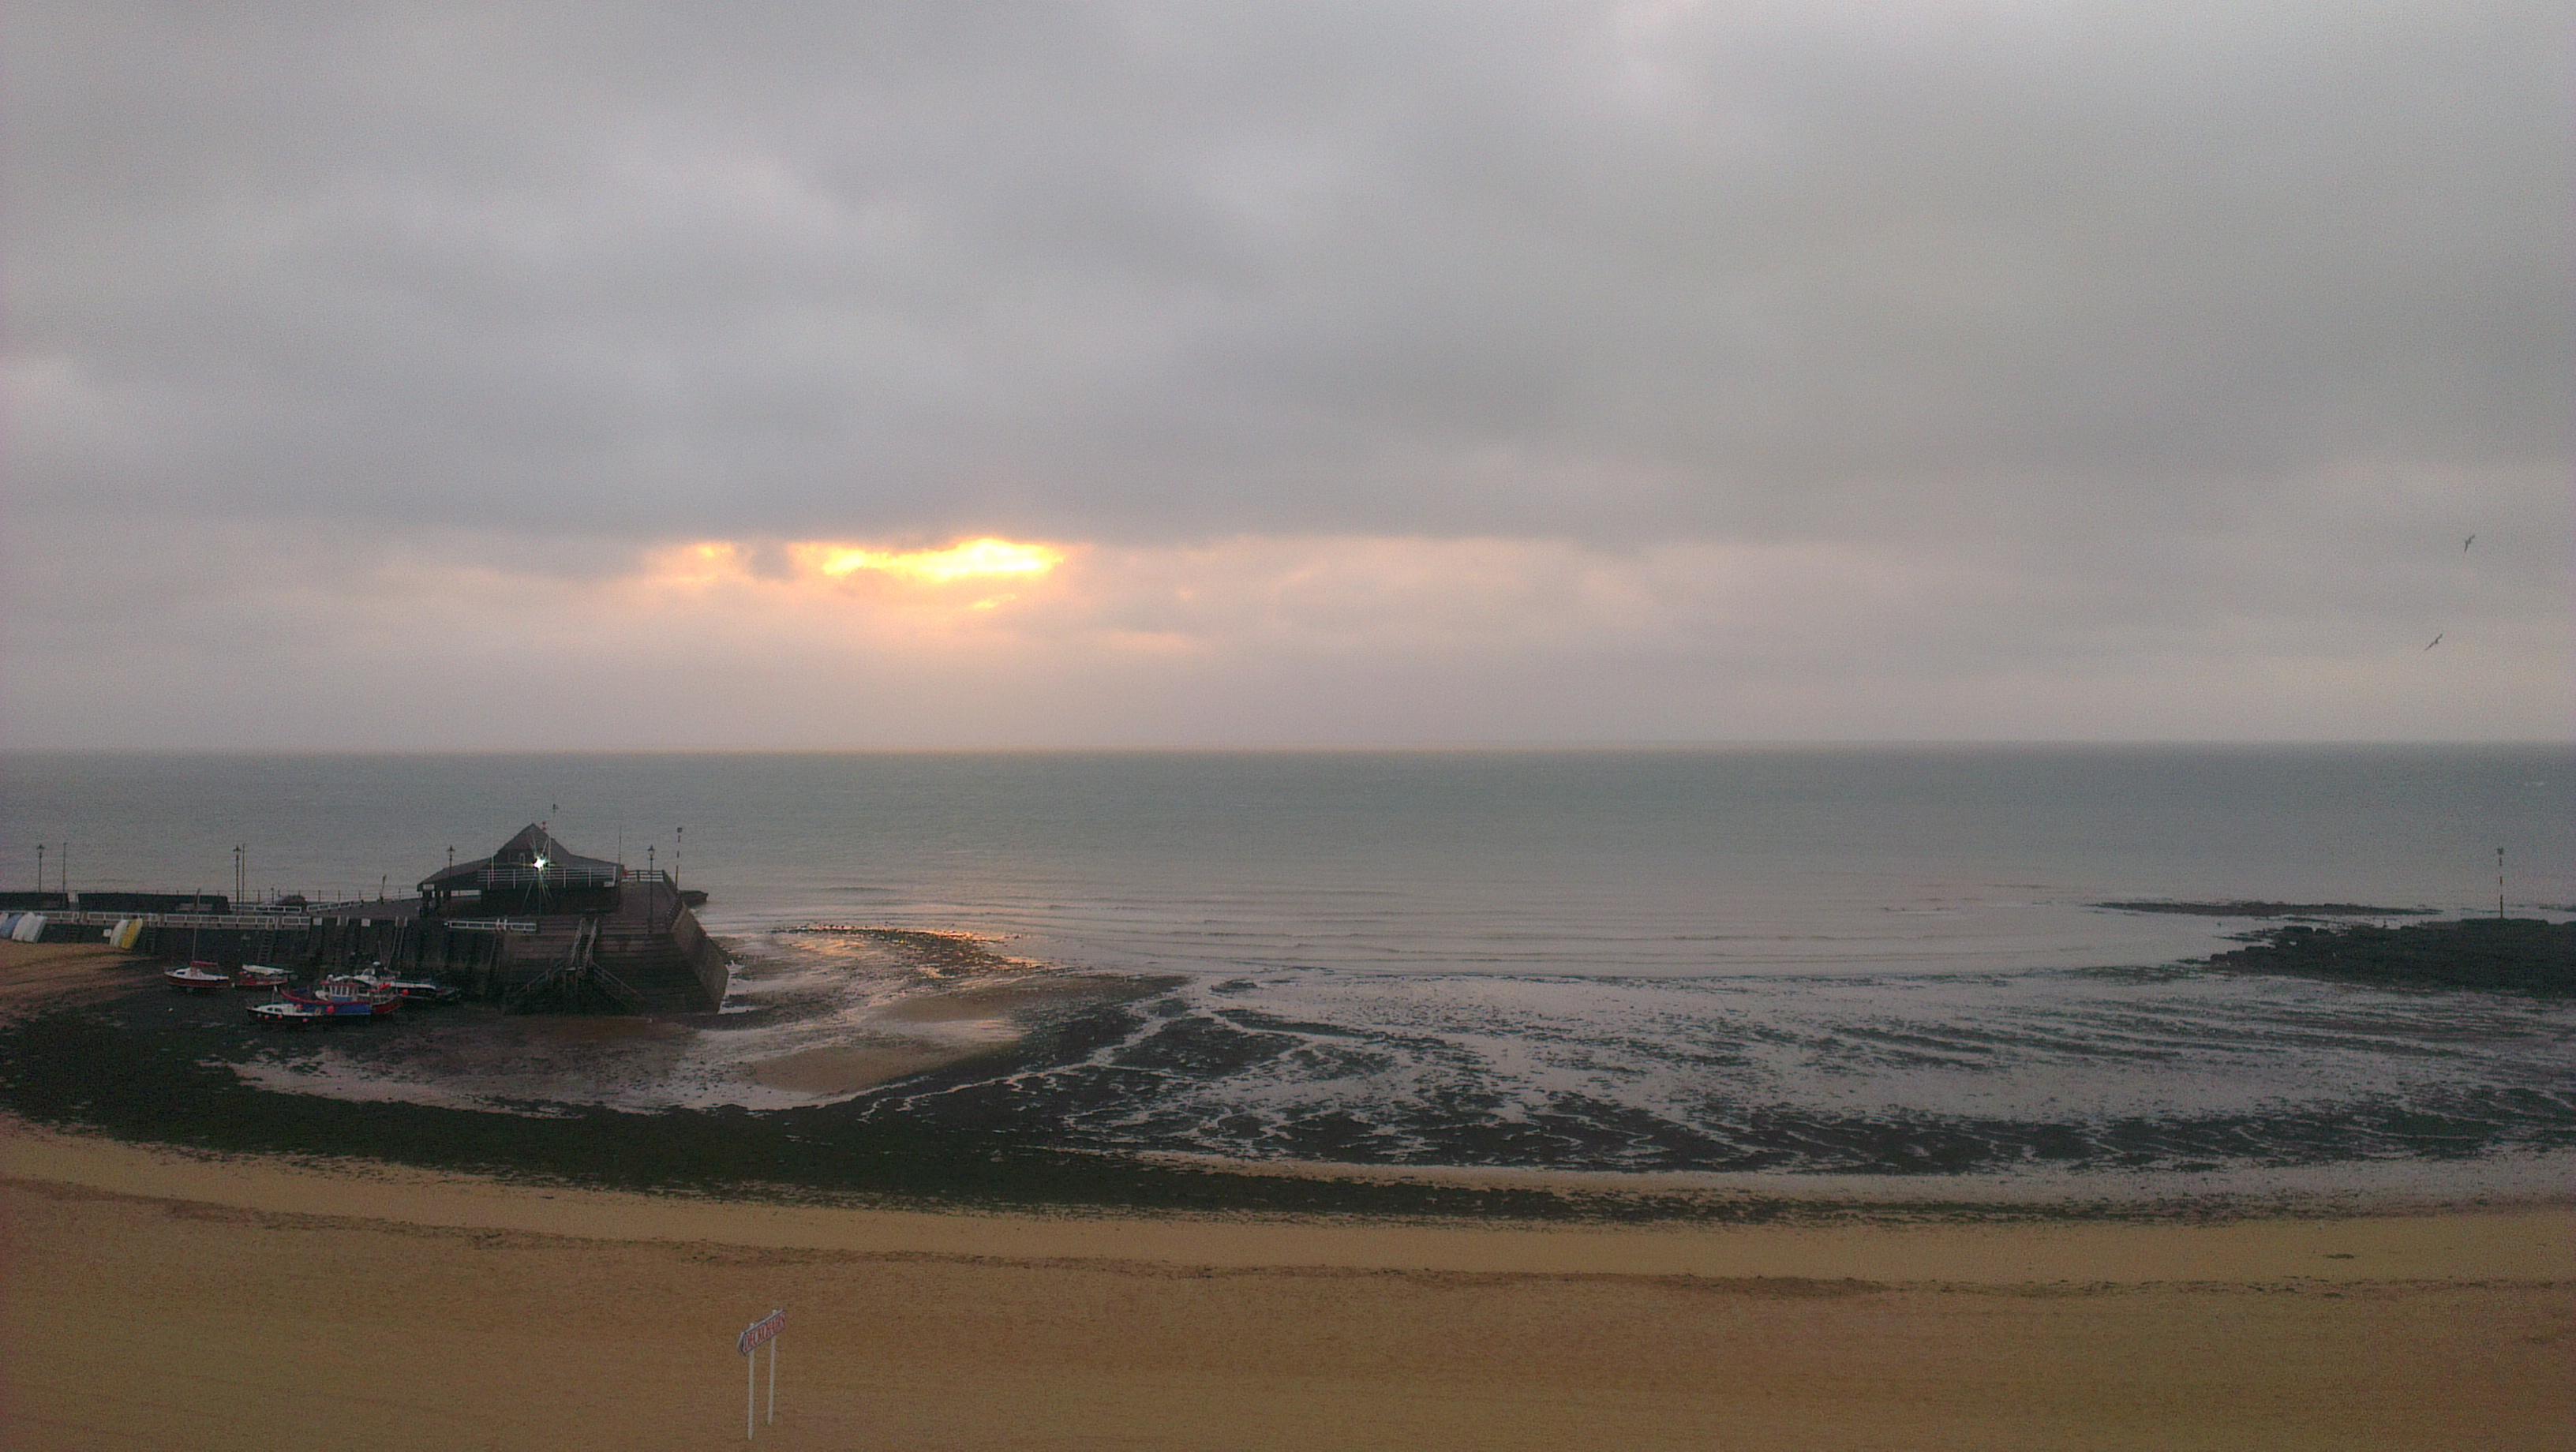 sunrise over Viking Bay, Broadstairs